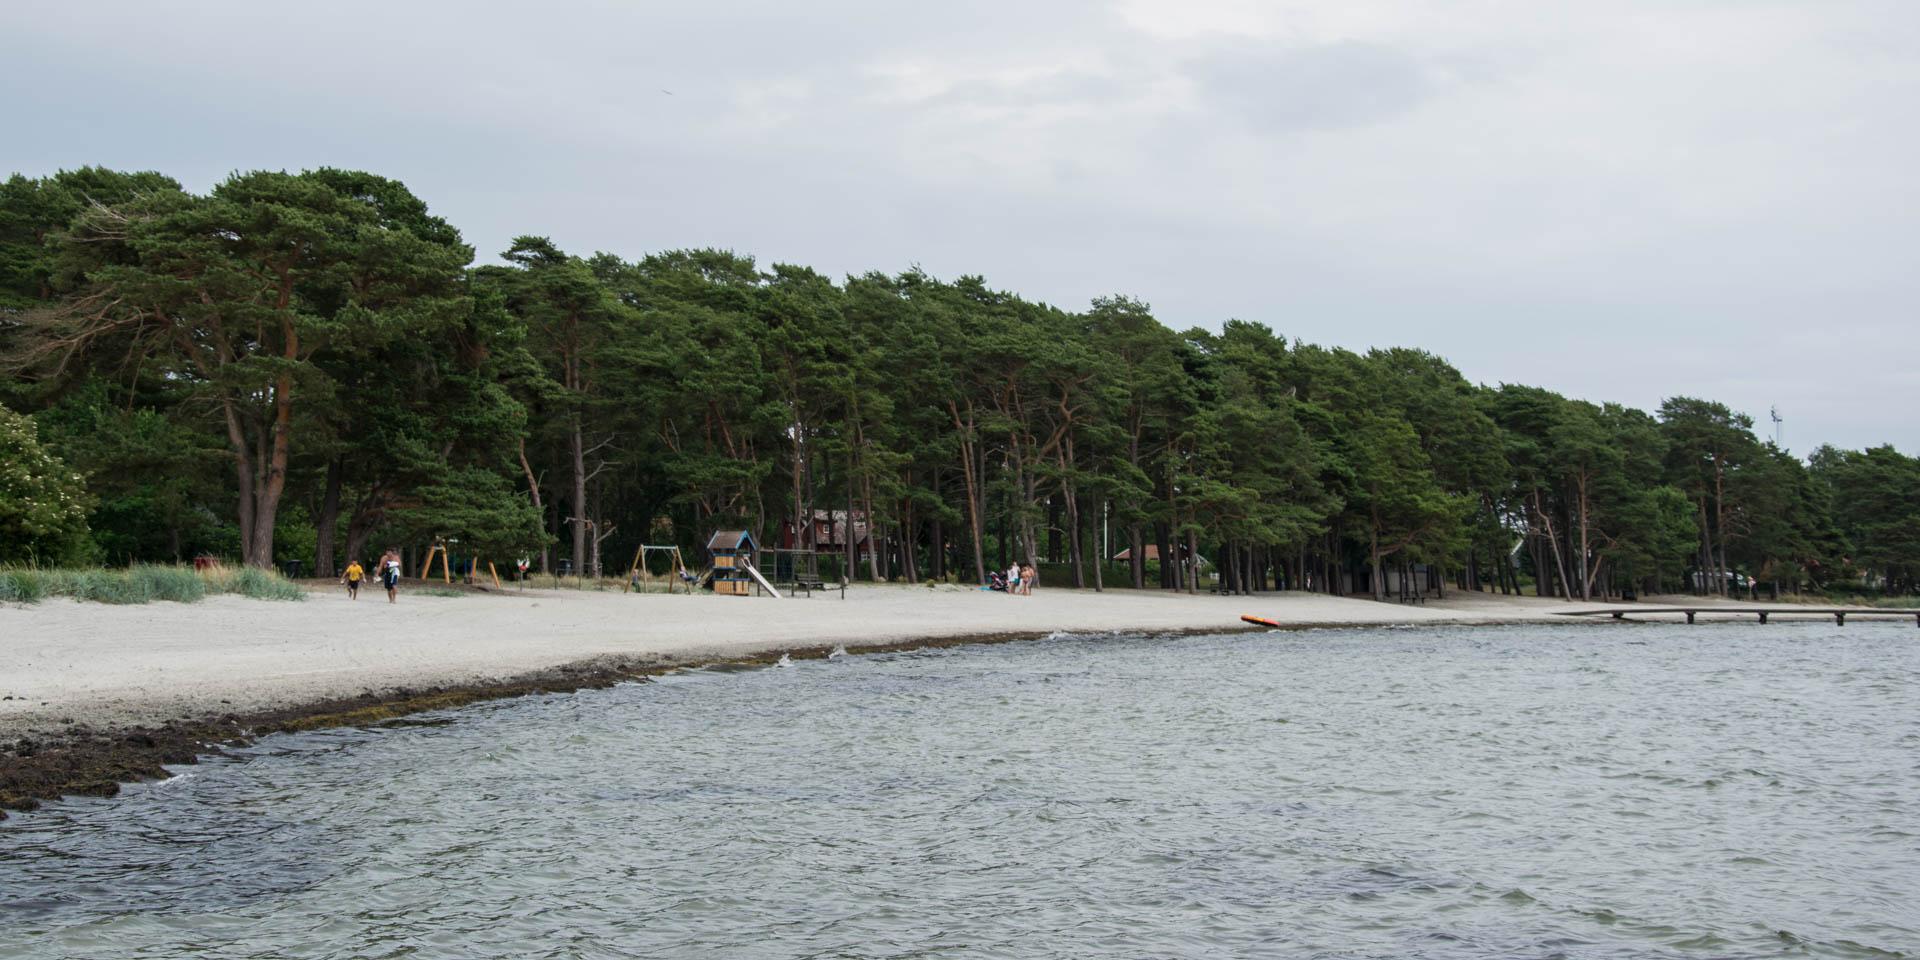 Hälleviks Strand 2016